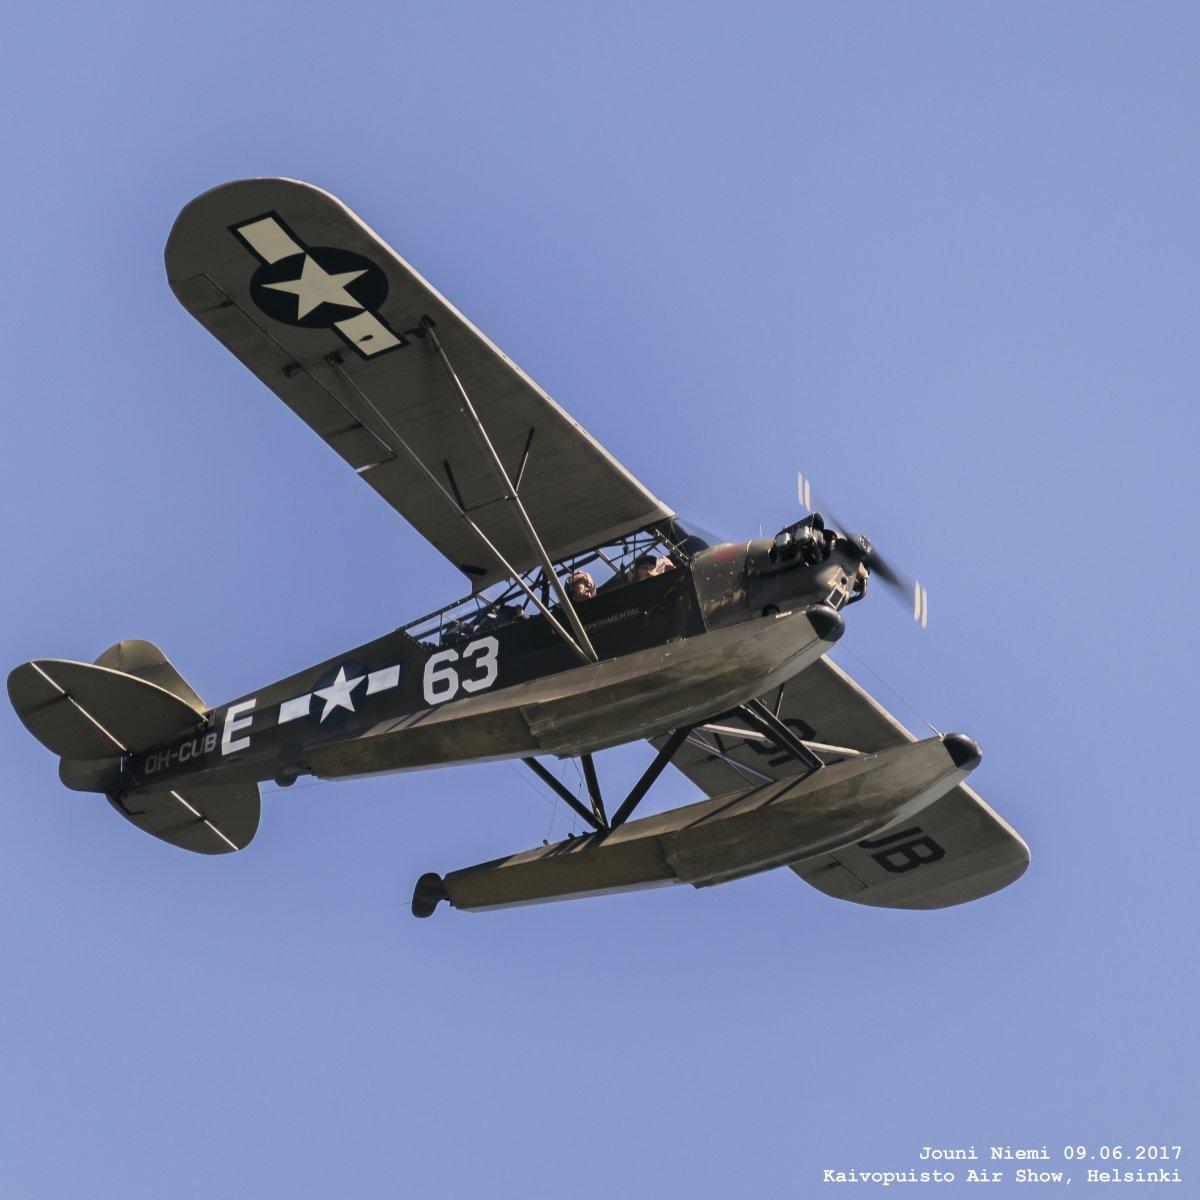 Piper J-3C-65D Mod. (USAAF L-4H Grasshopper s/n 12320) OH-CUB Kaivopuiston Lentonäytöksessä